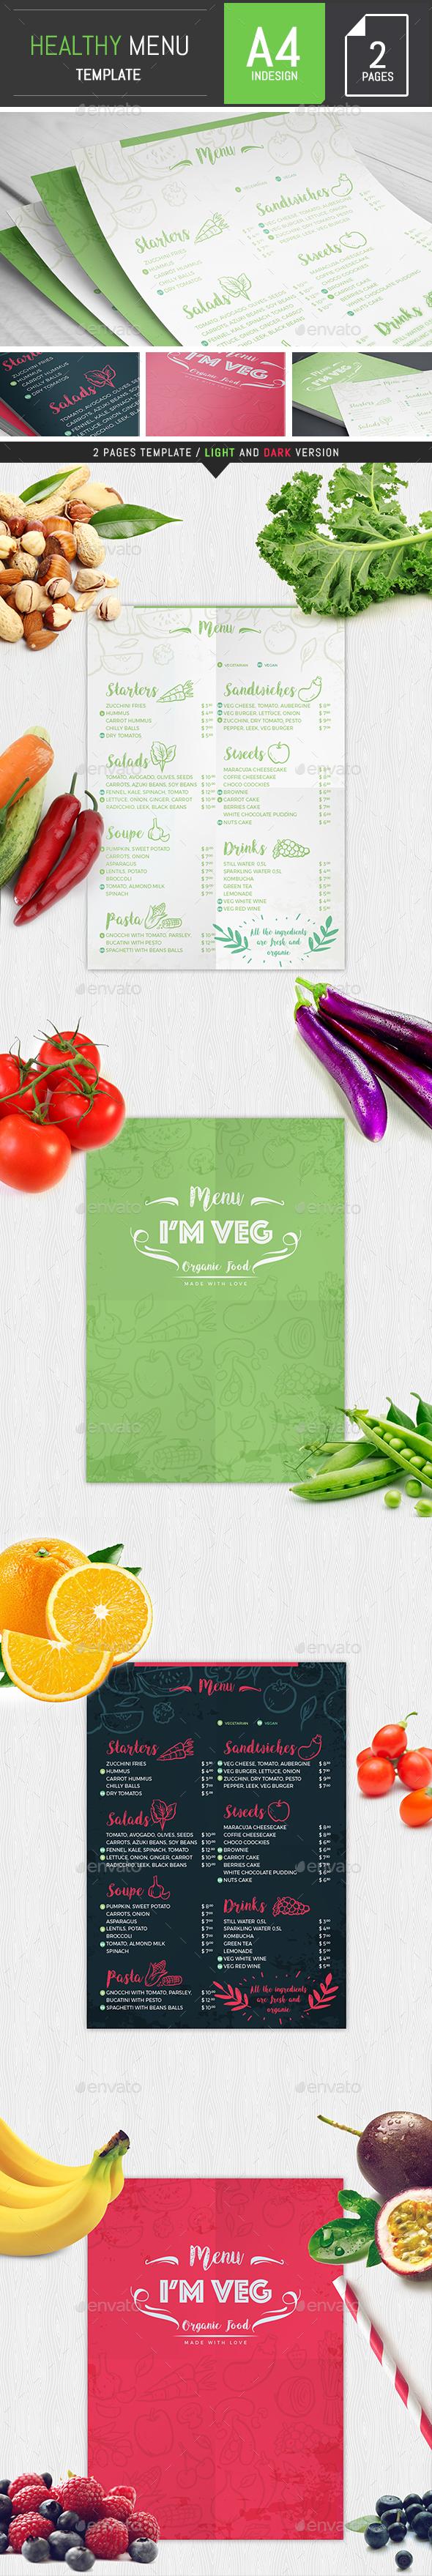 Healthy Food Menu Template - Food Menus Print Templates